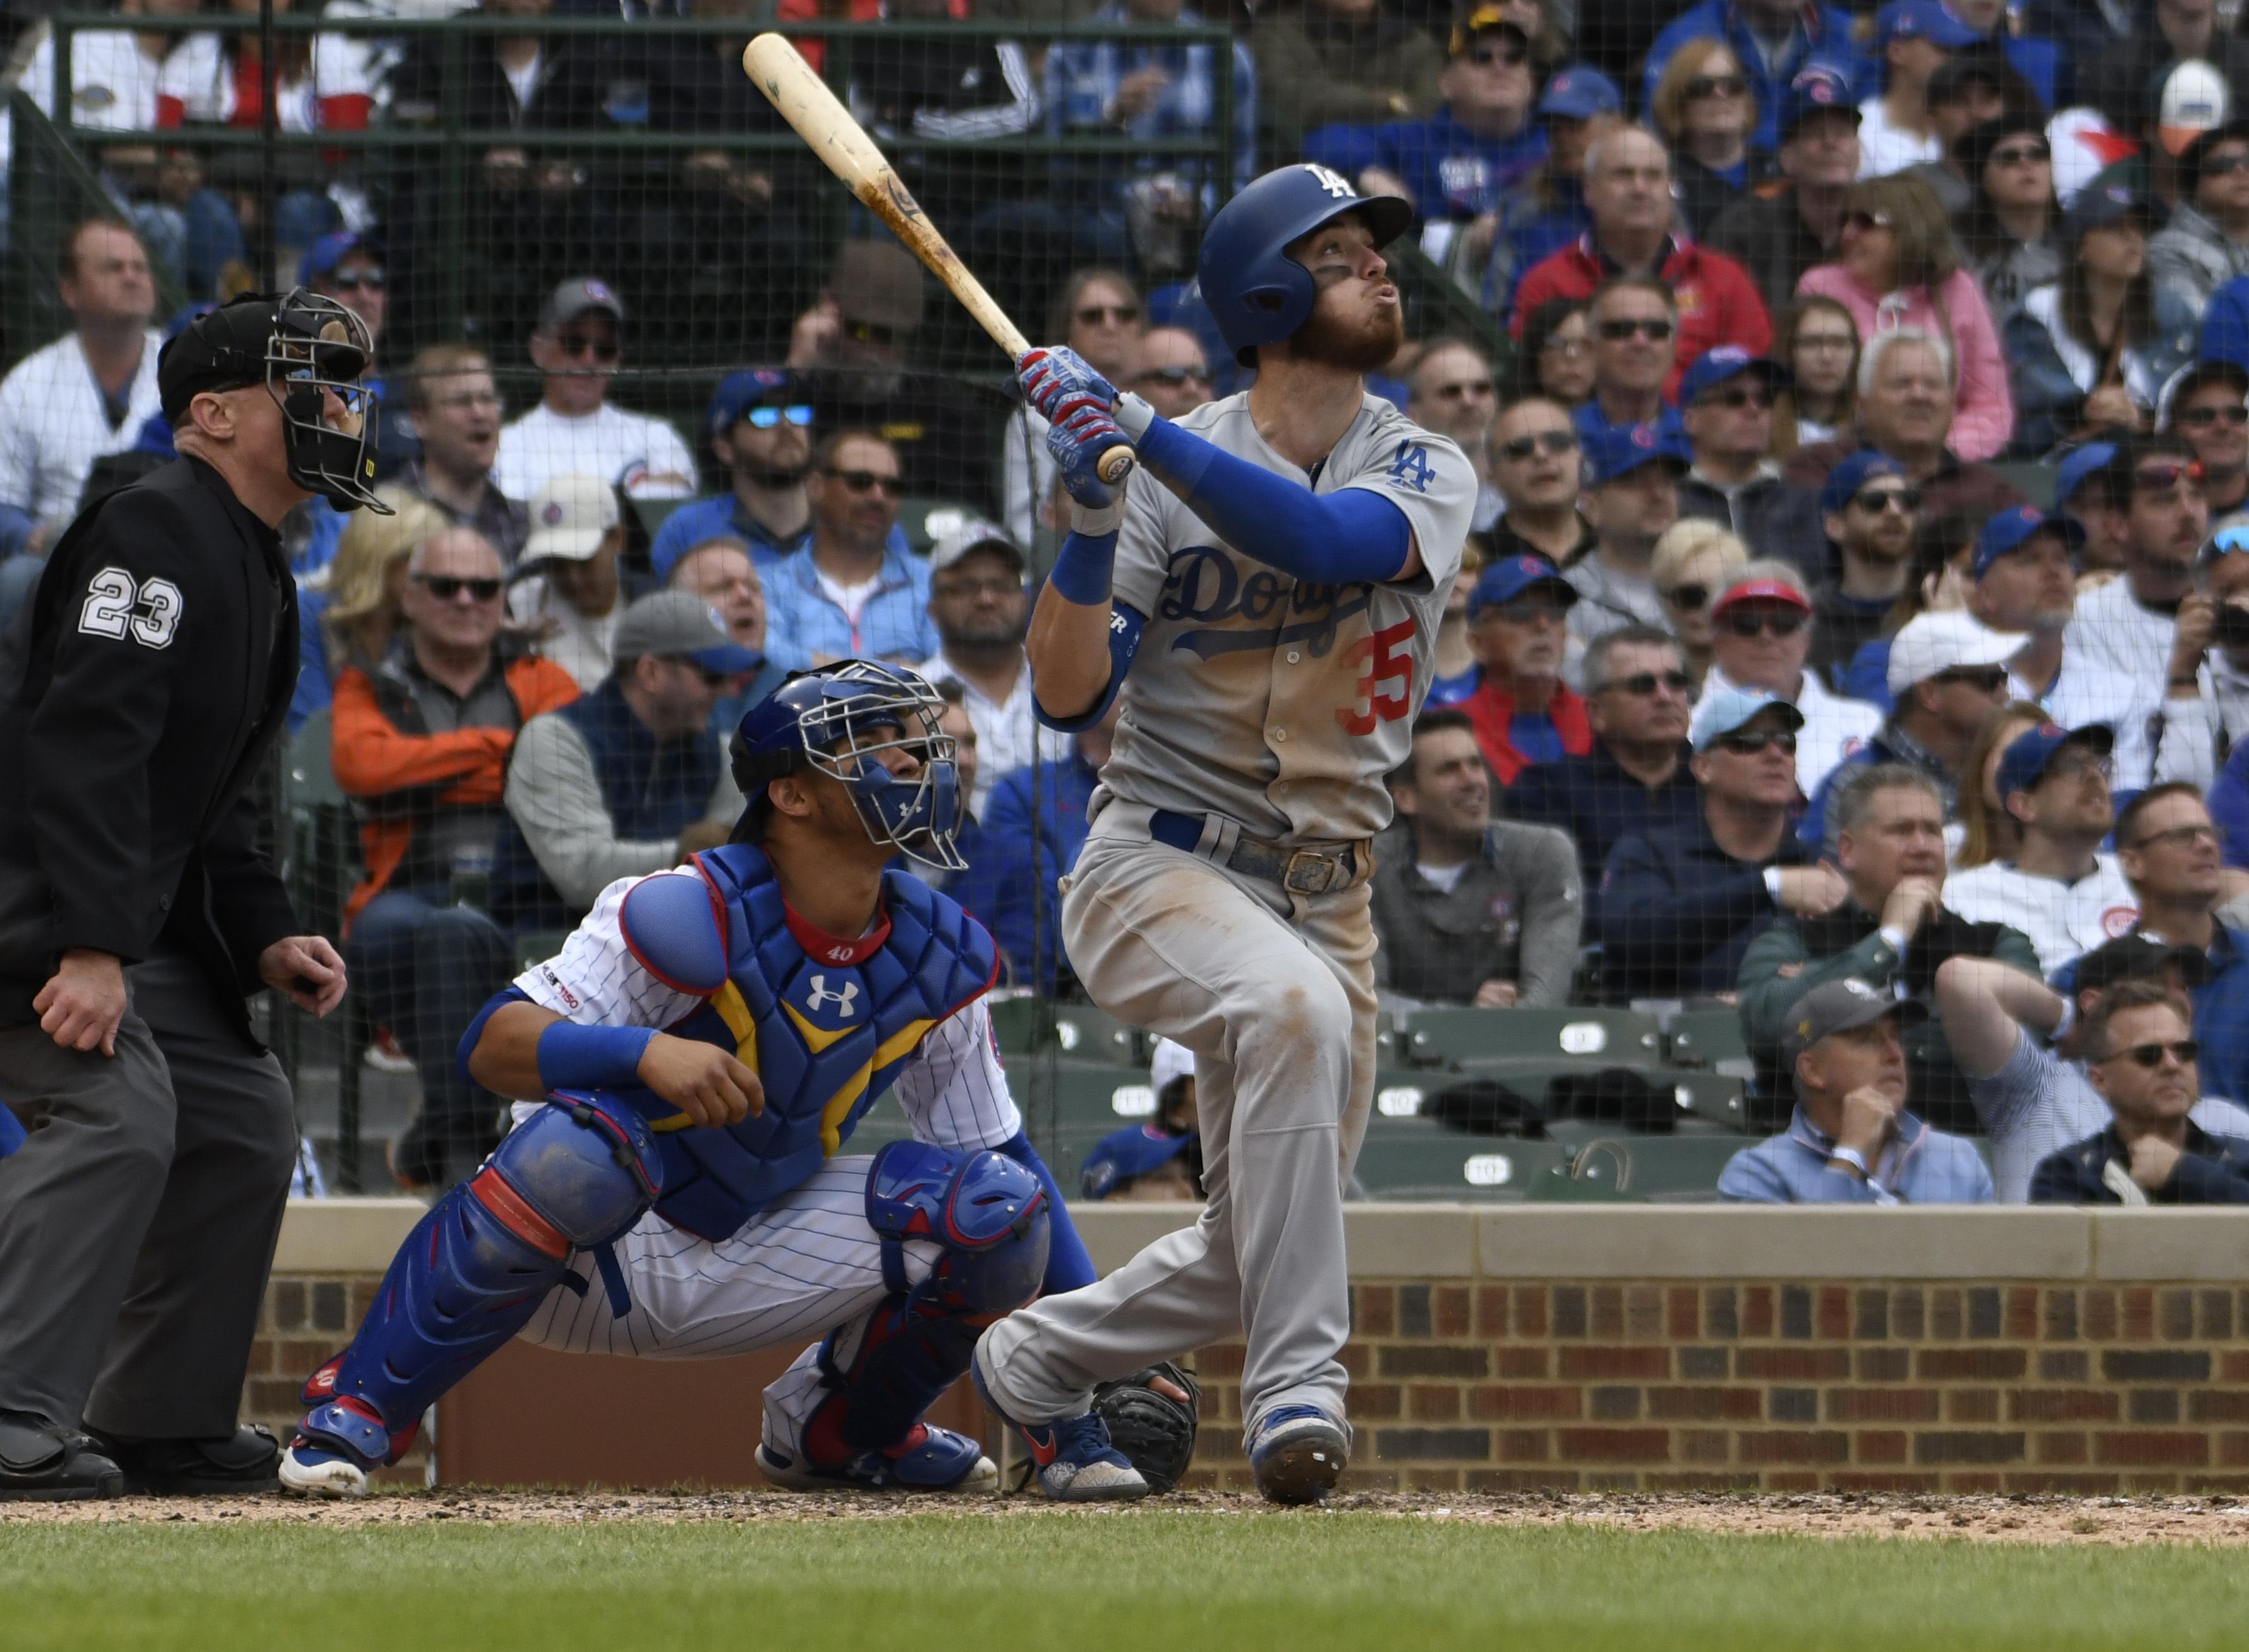 Lester solid in return, but Dodgers get past Cubs 2-1